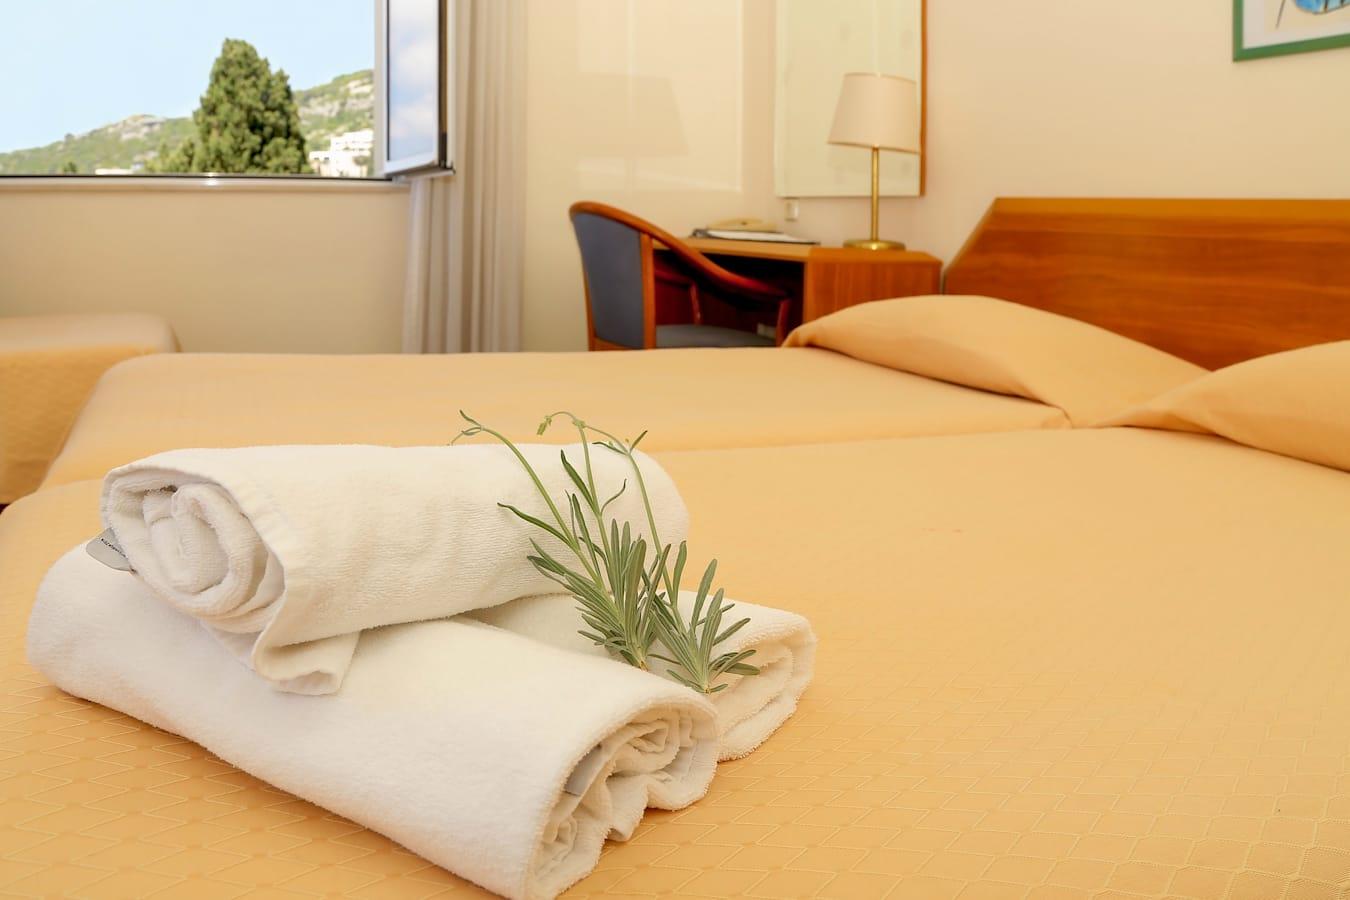 komodor-hotel-twin-room-seaview.jpg